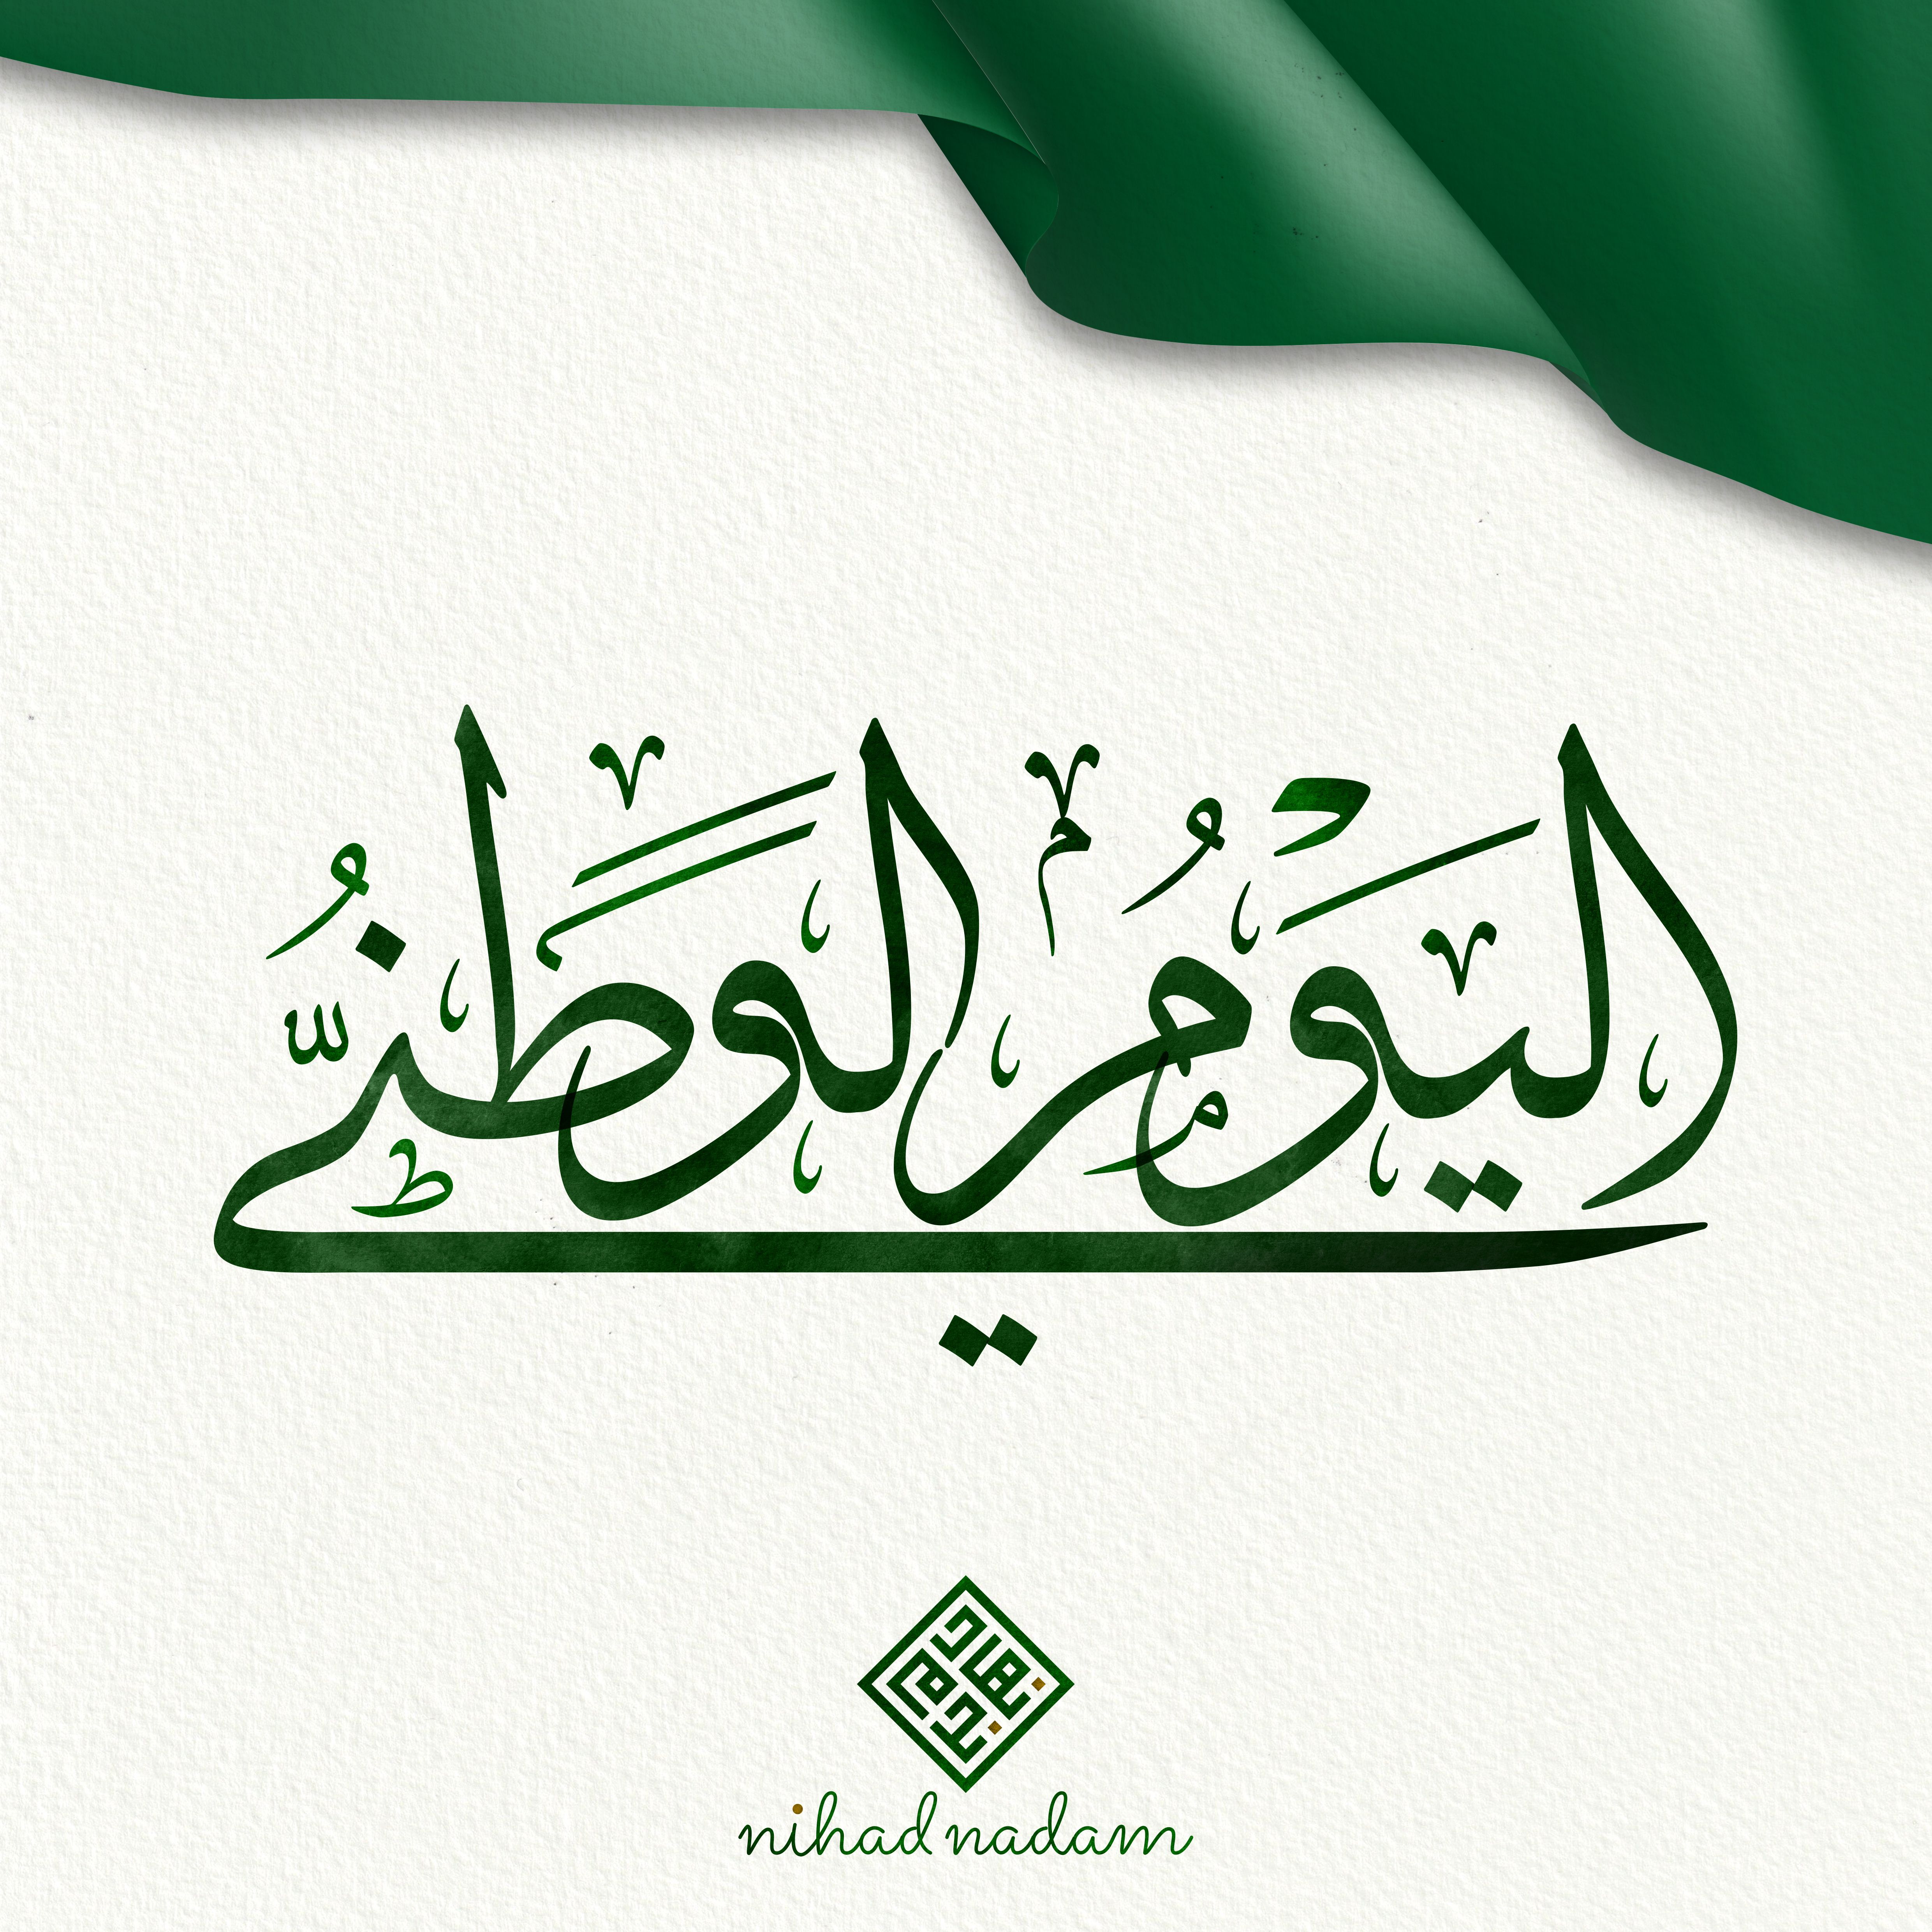 Saudi National Day Design National Day Saudi Eid Images Photography Inspiration Portrait